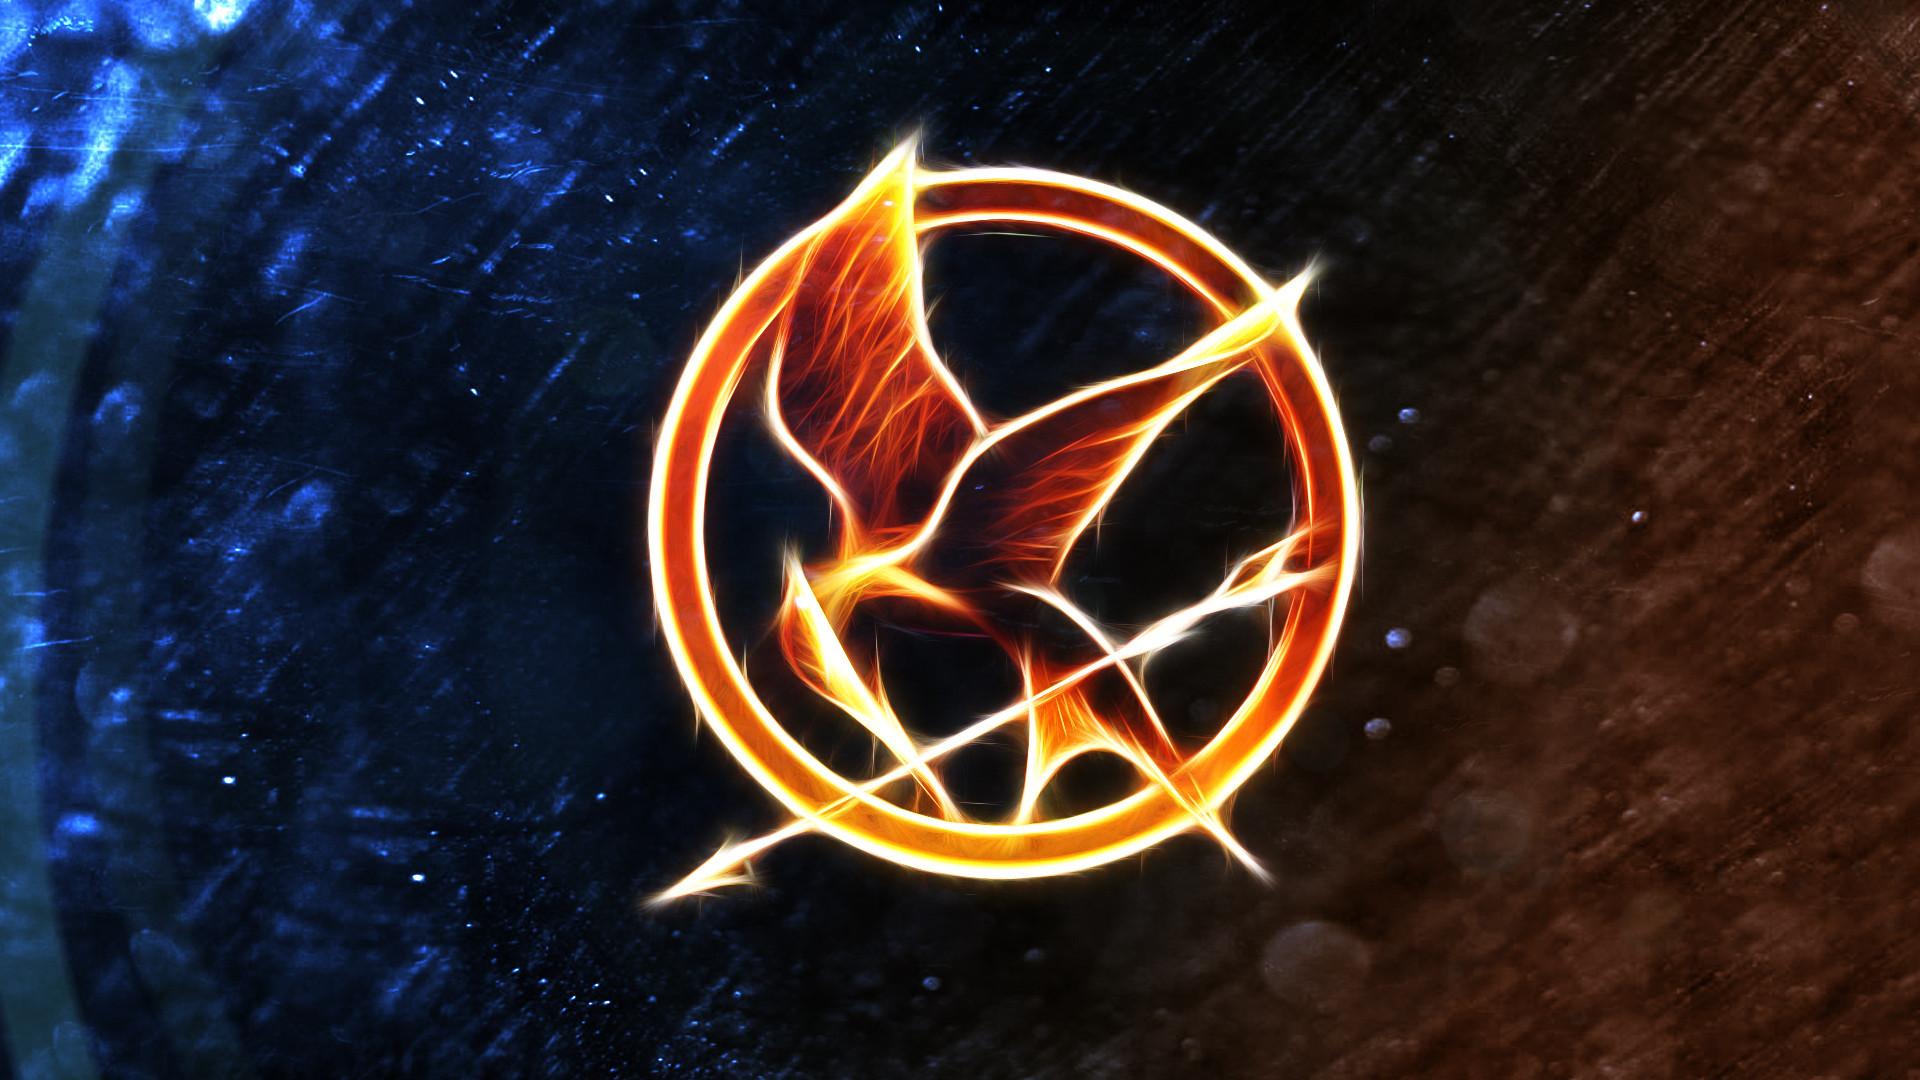 Hunger Games Mockingjay Wallpaper - WallpaperSafari